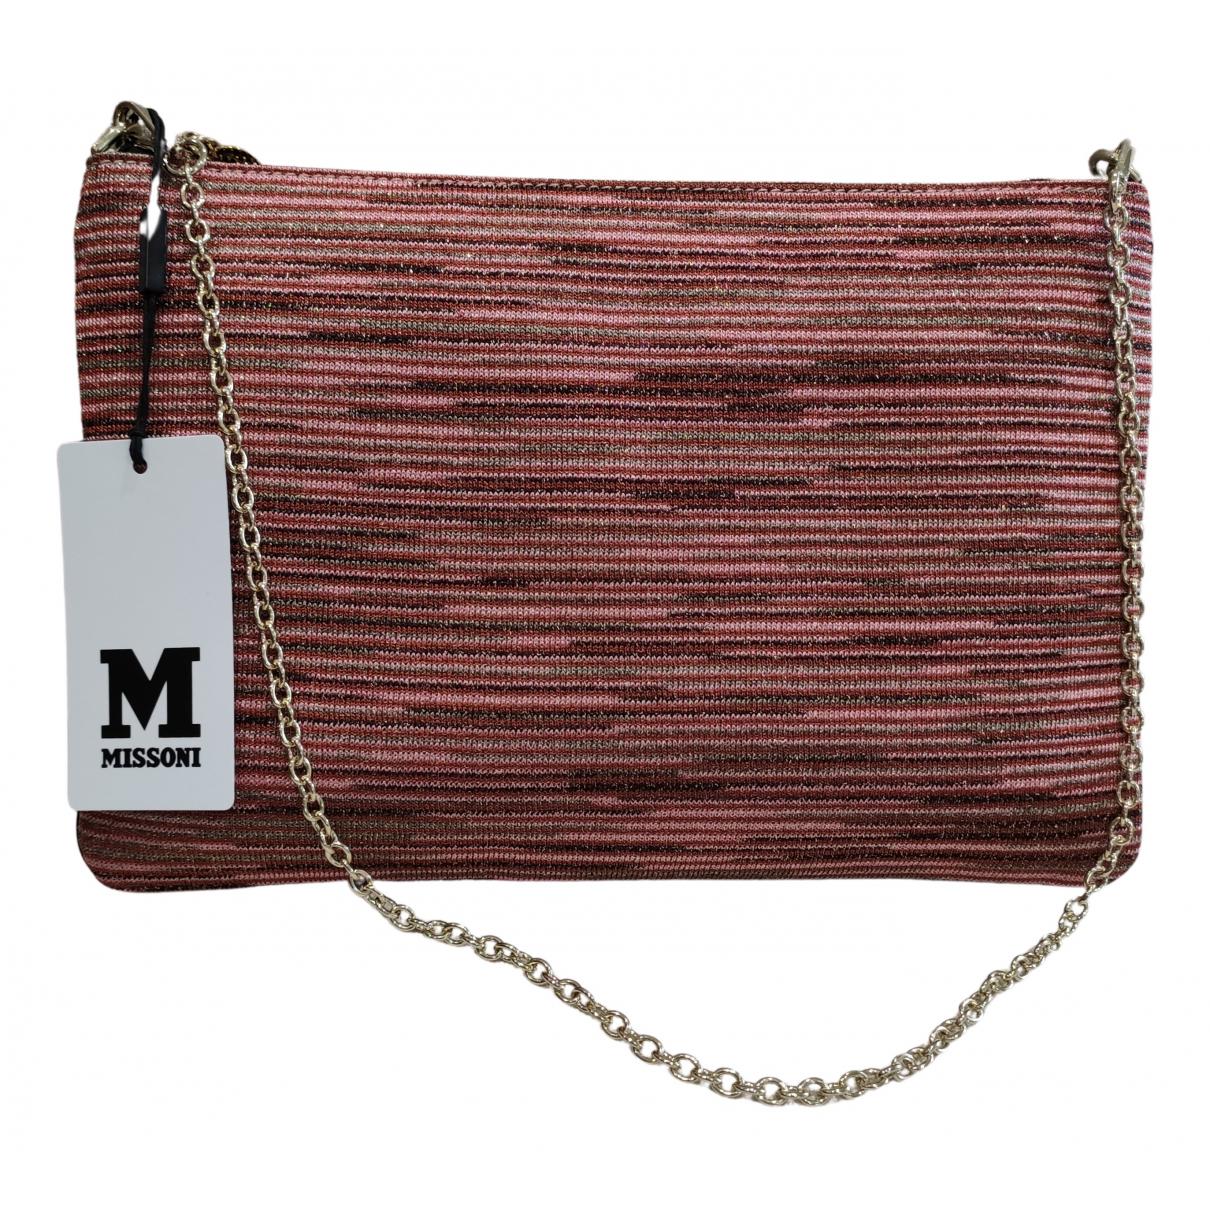 Pochette Tweed M Missoni